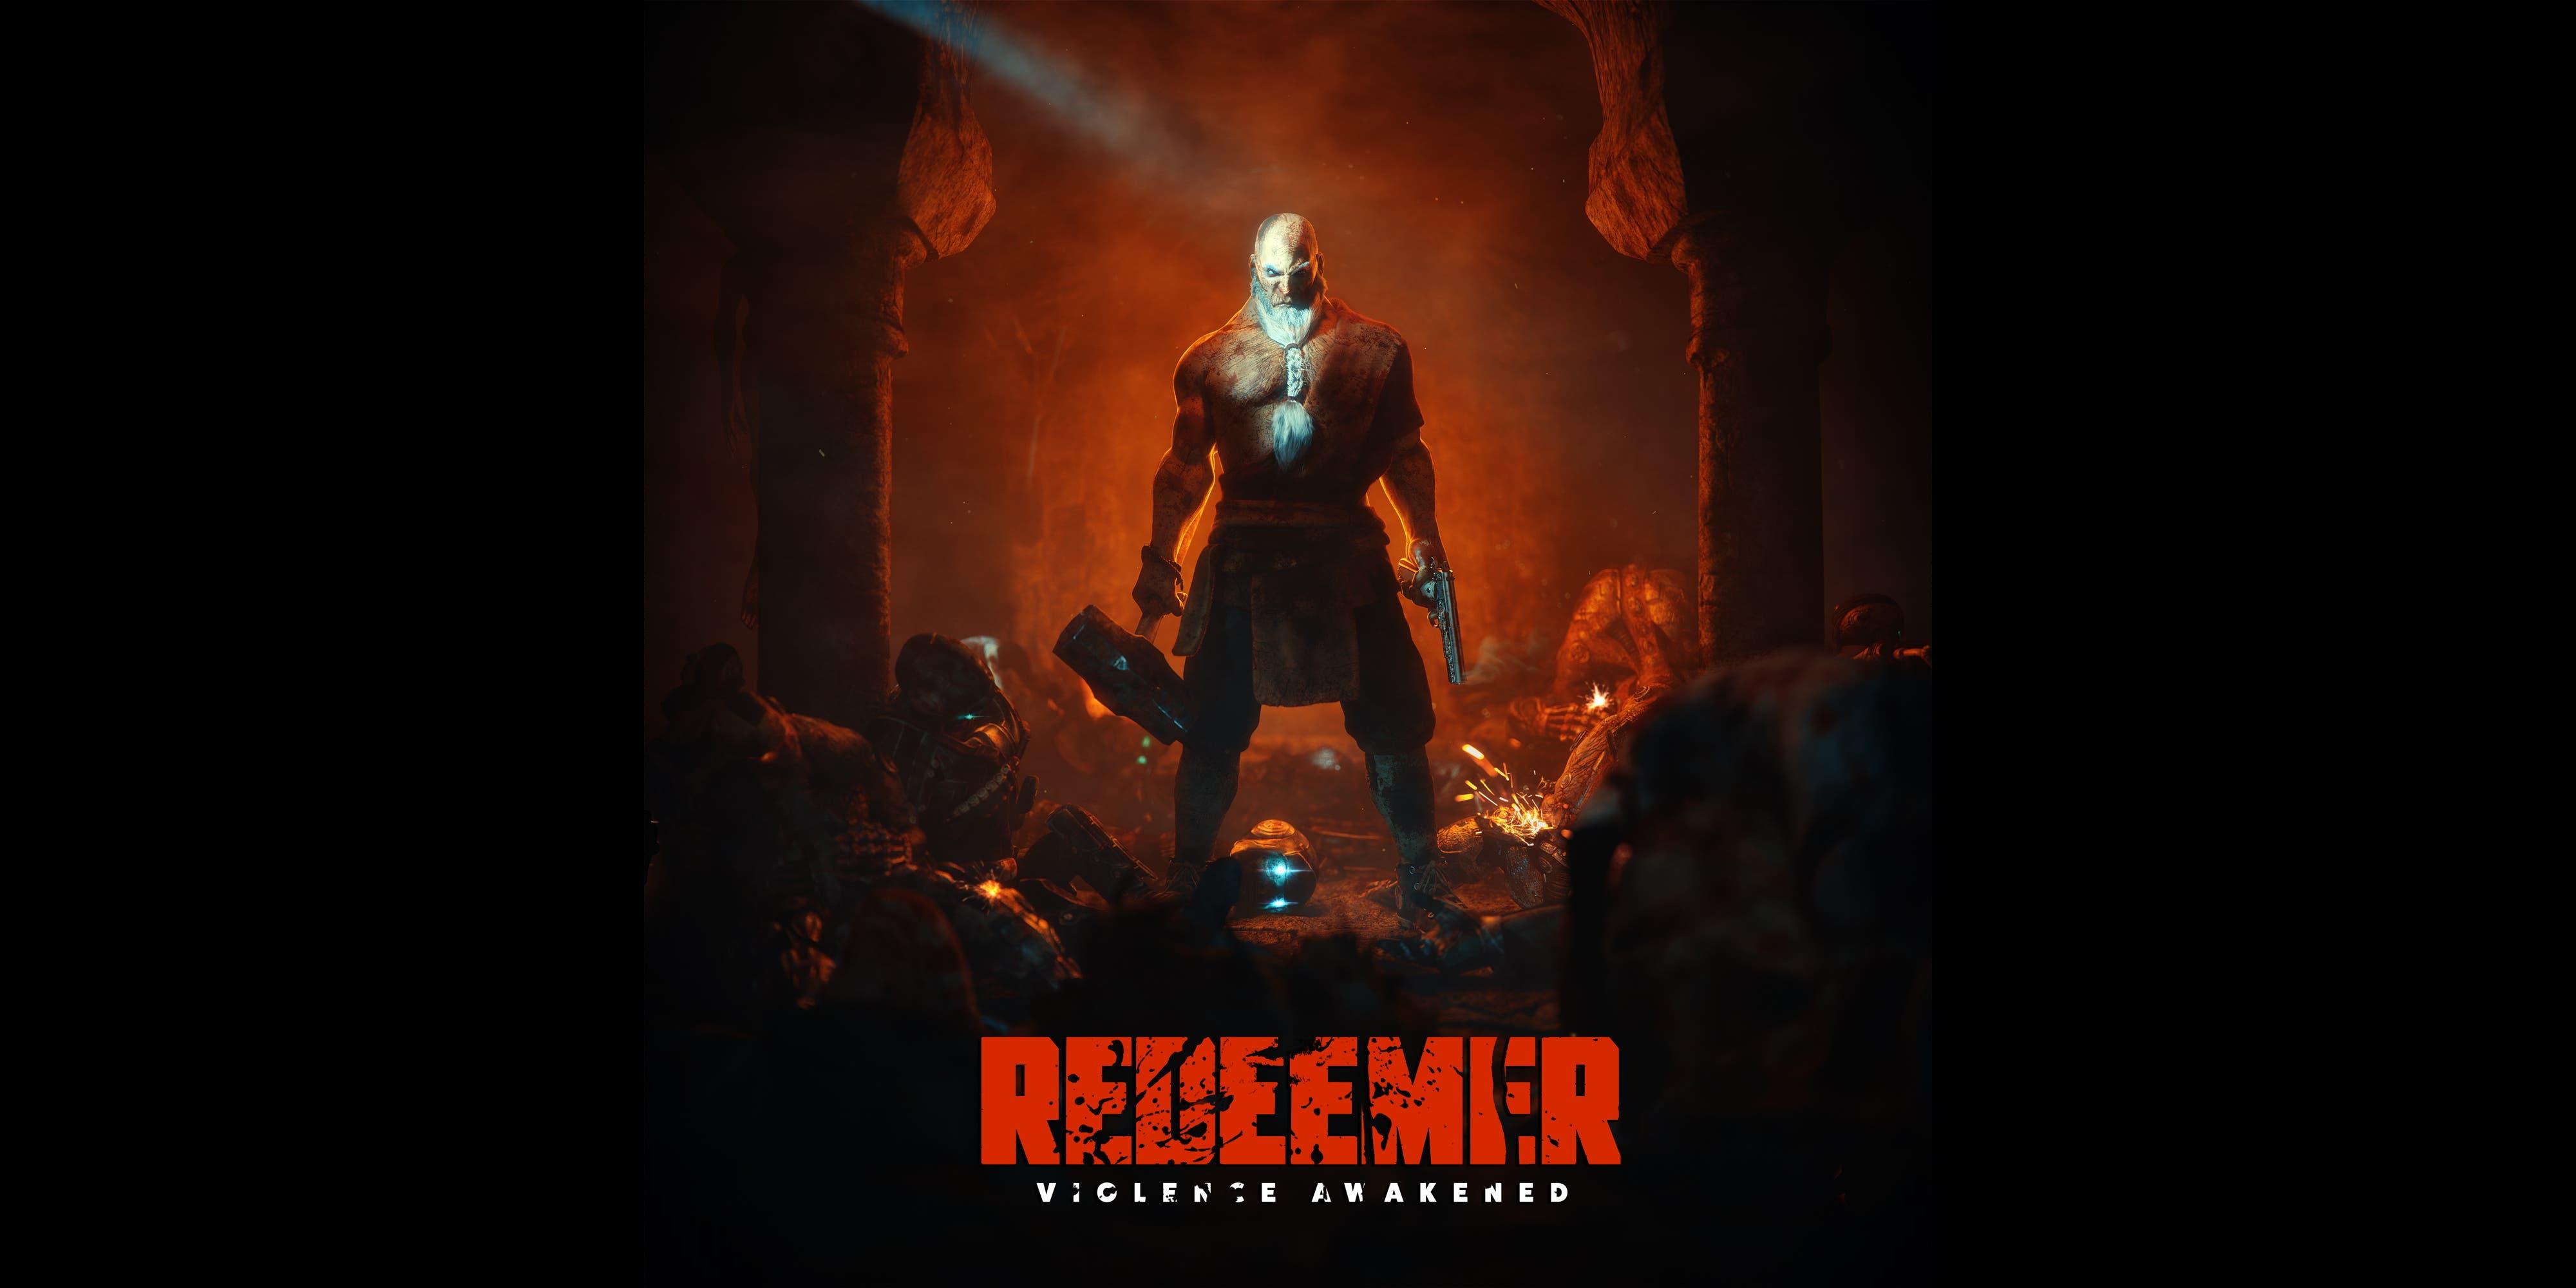 Redeemer featured wide